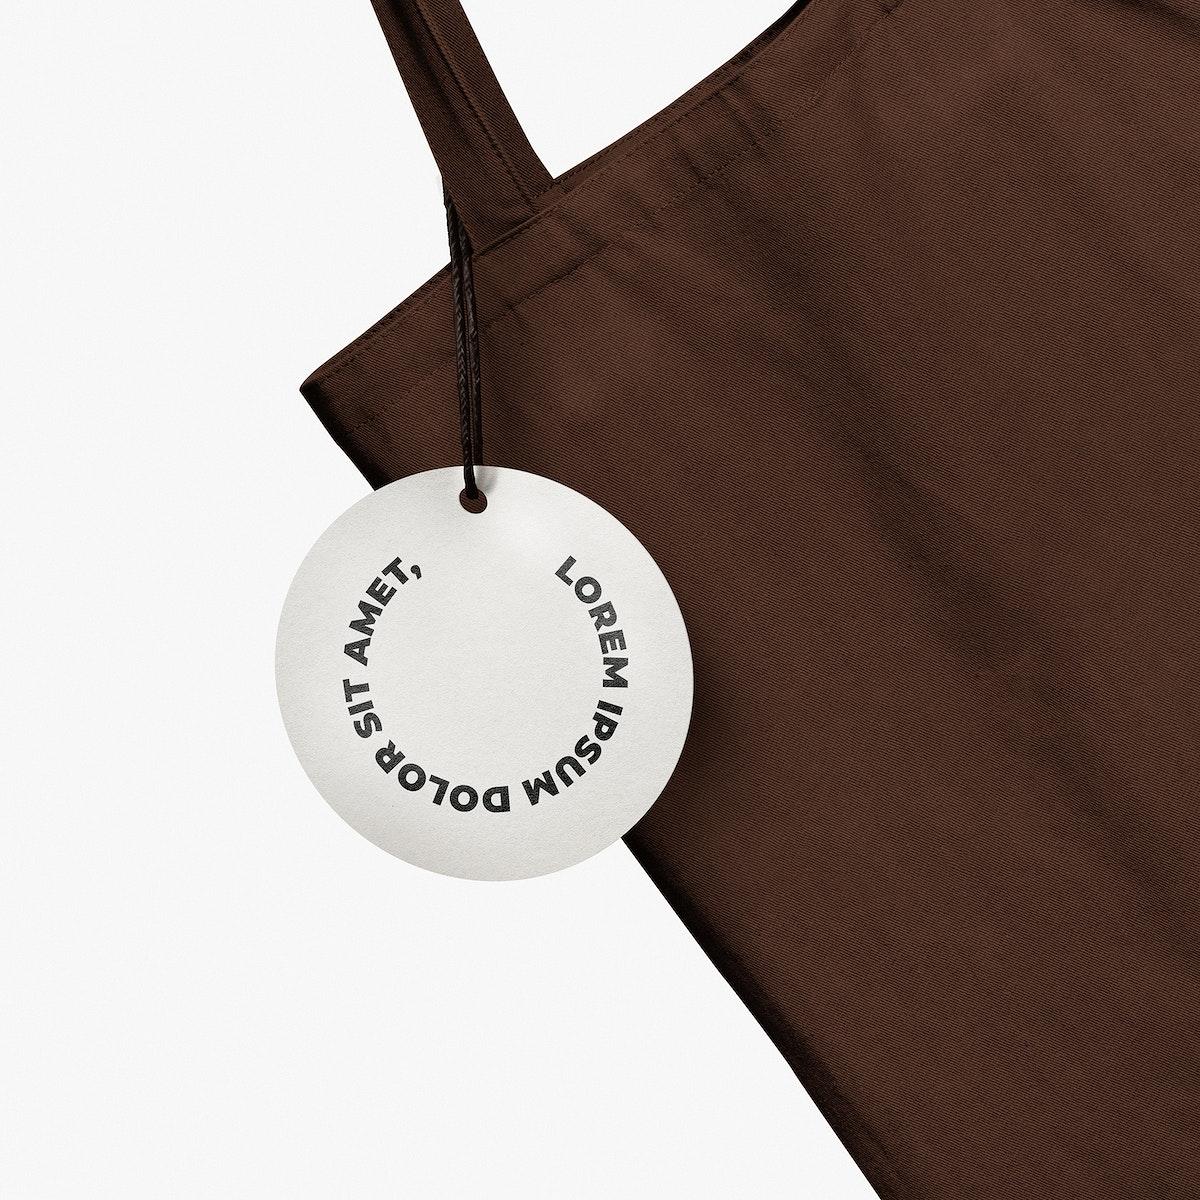 Tote bag mockup psd and tag label